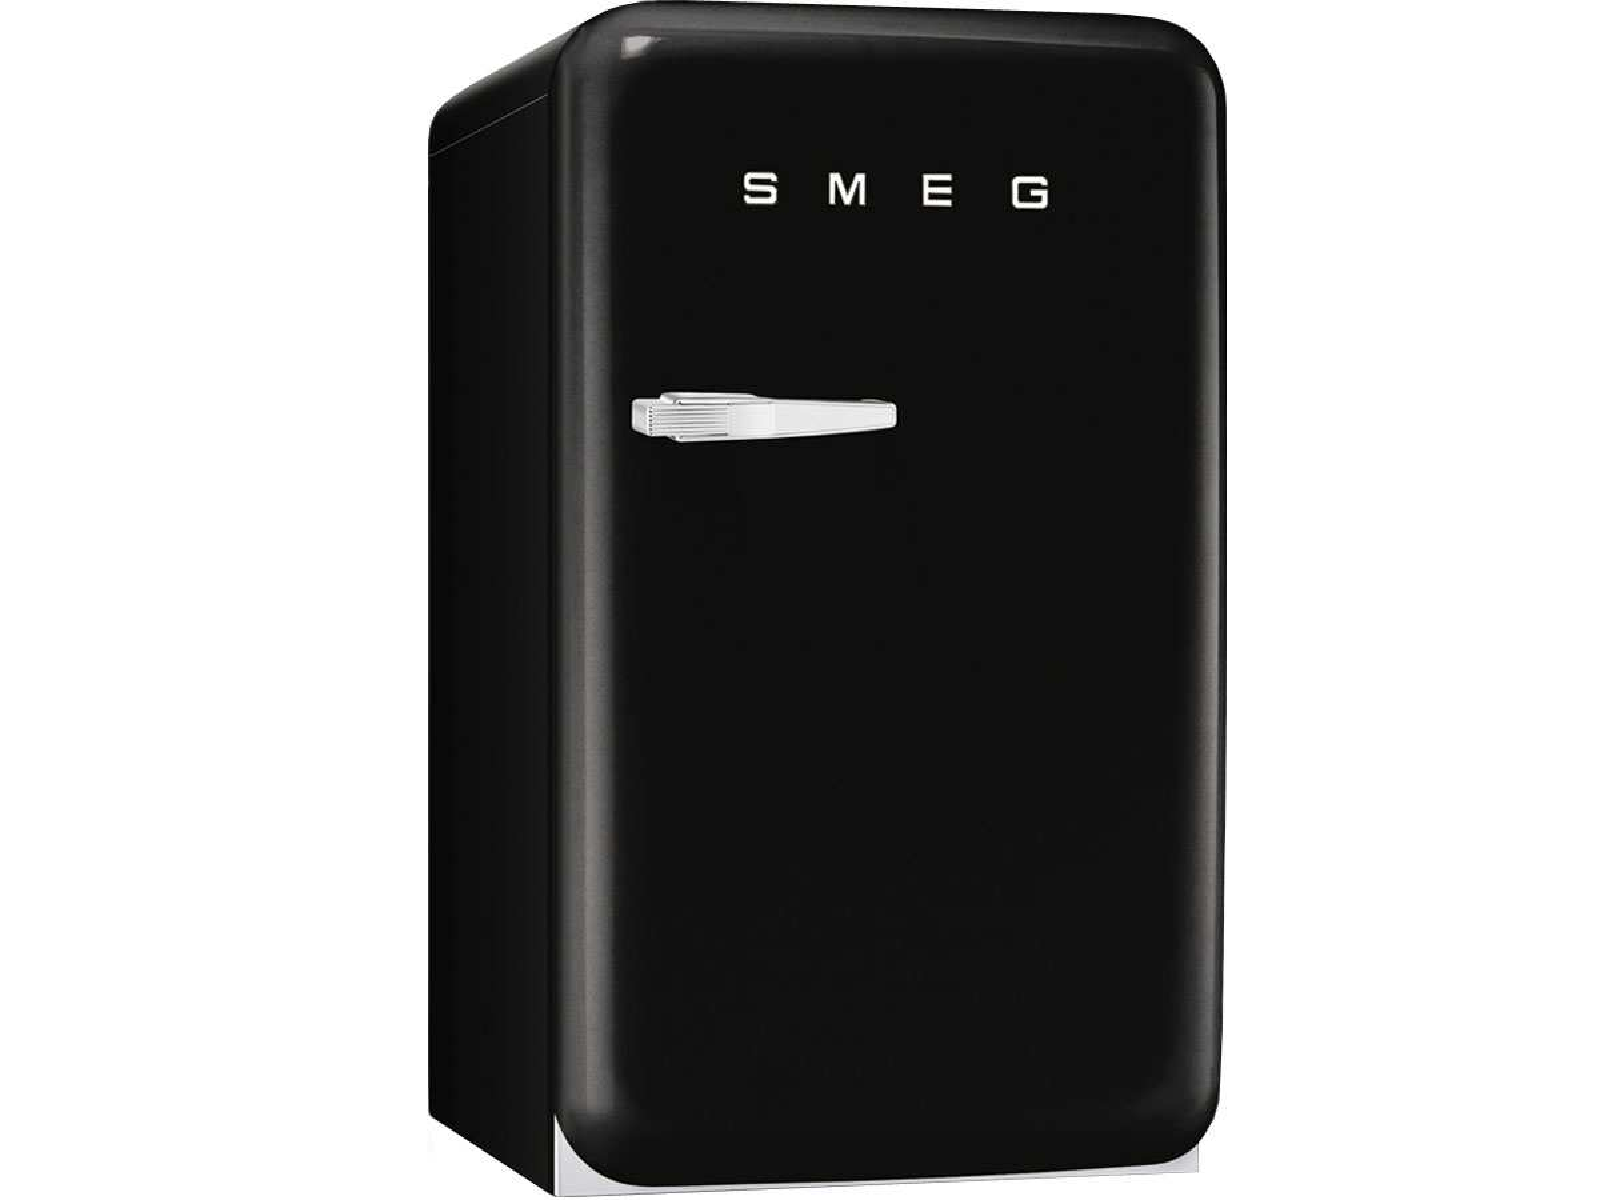 Smeg Kühlschrank Nach Transport : Smeg fab rne standkühlschrank schwarz